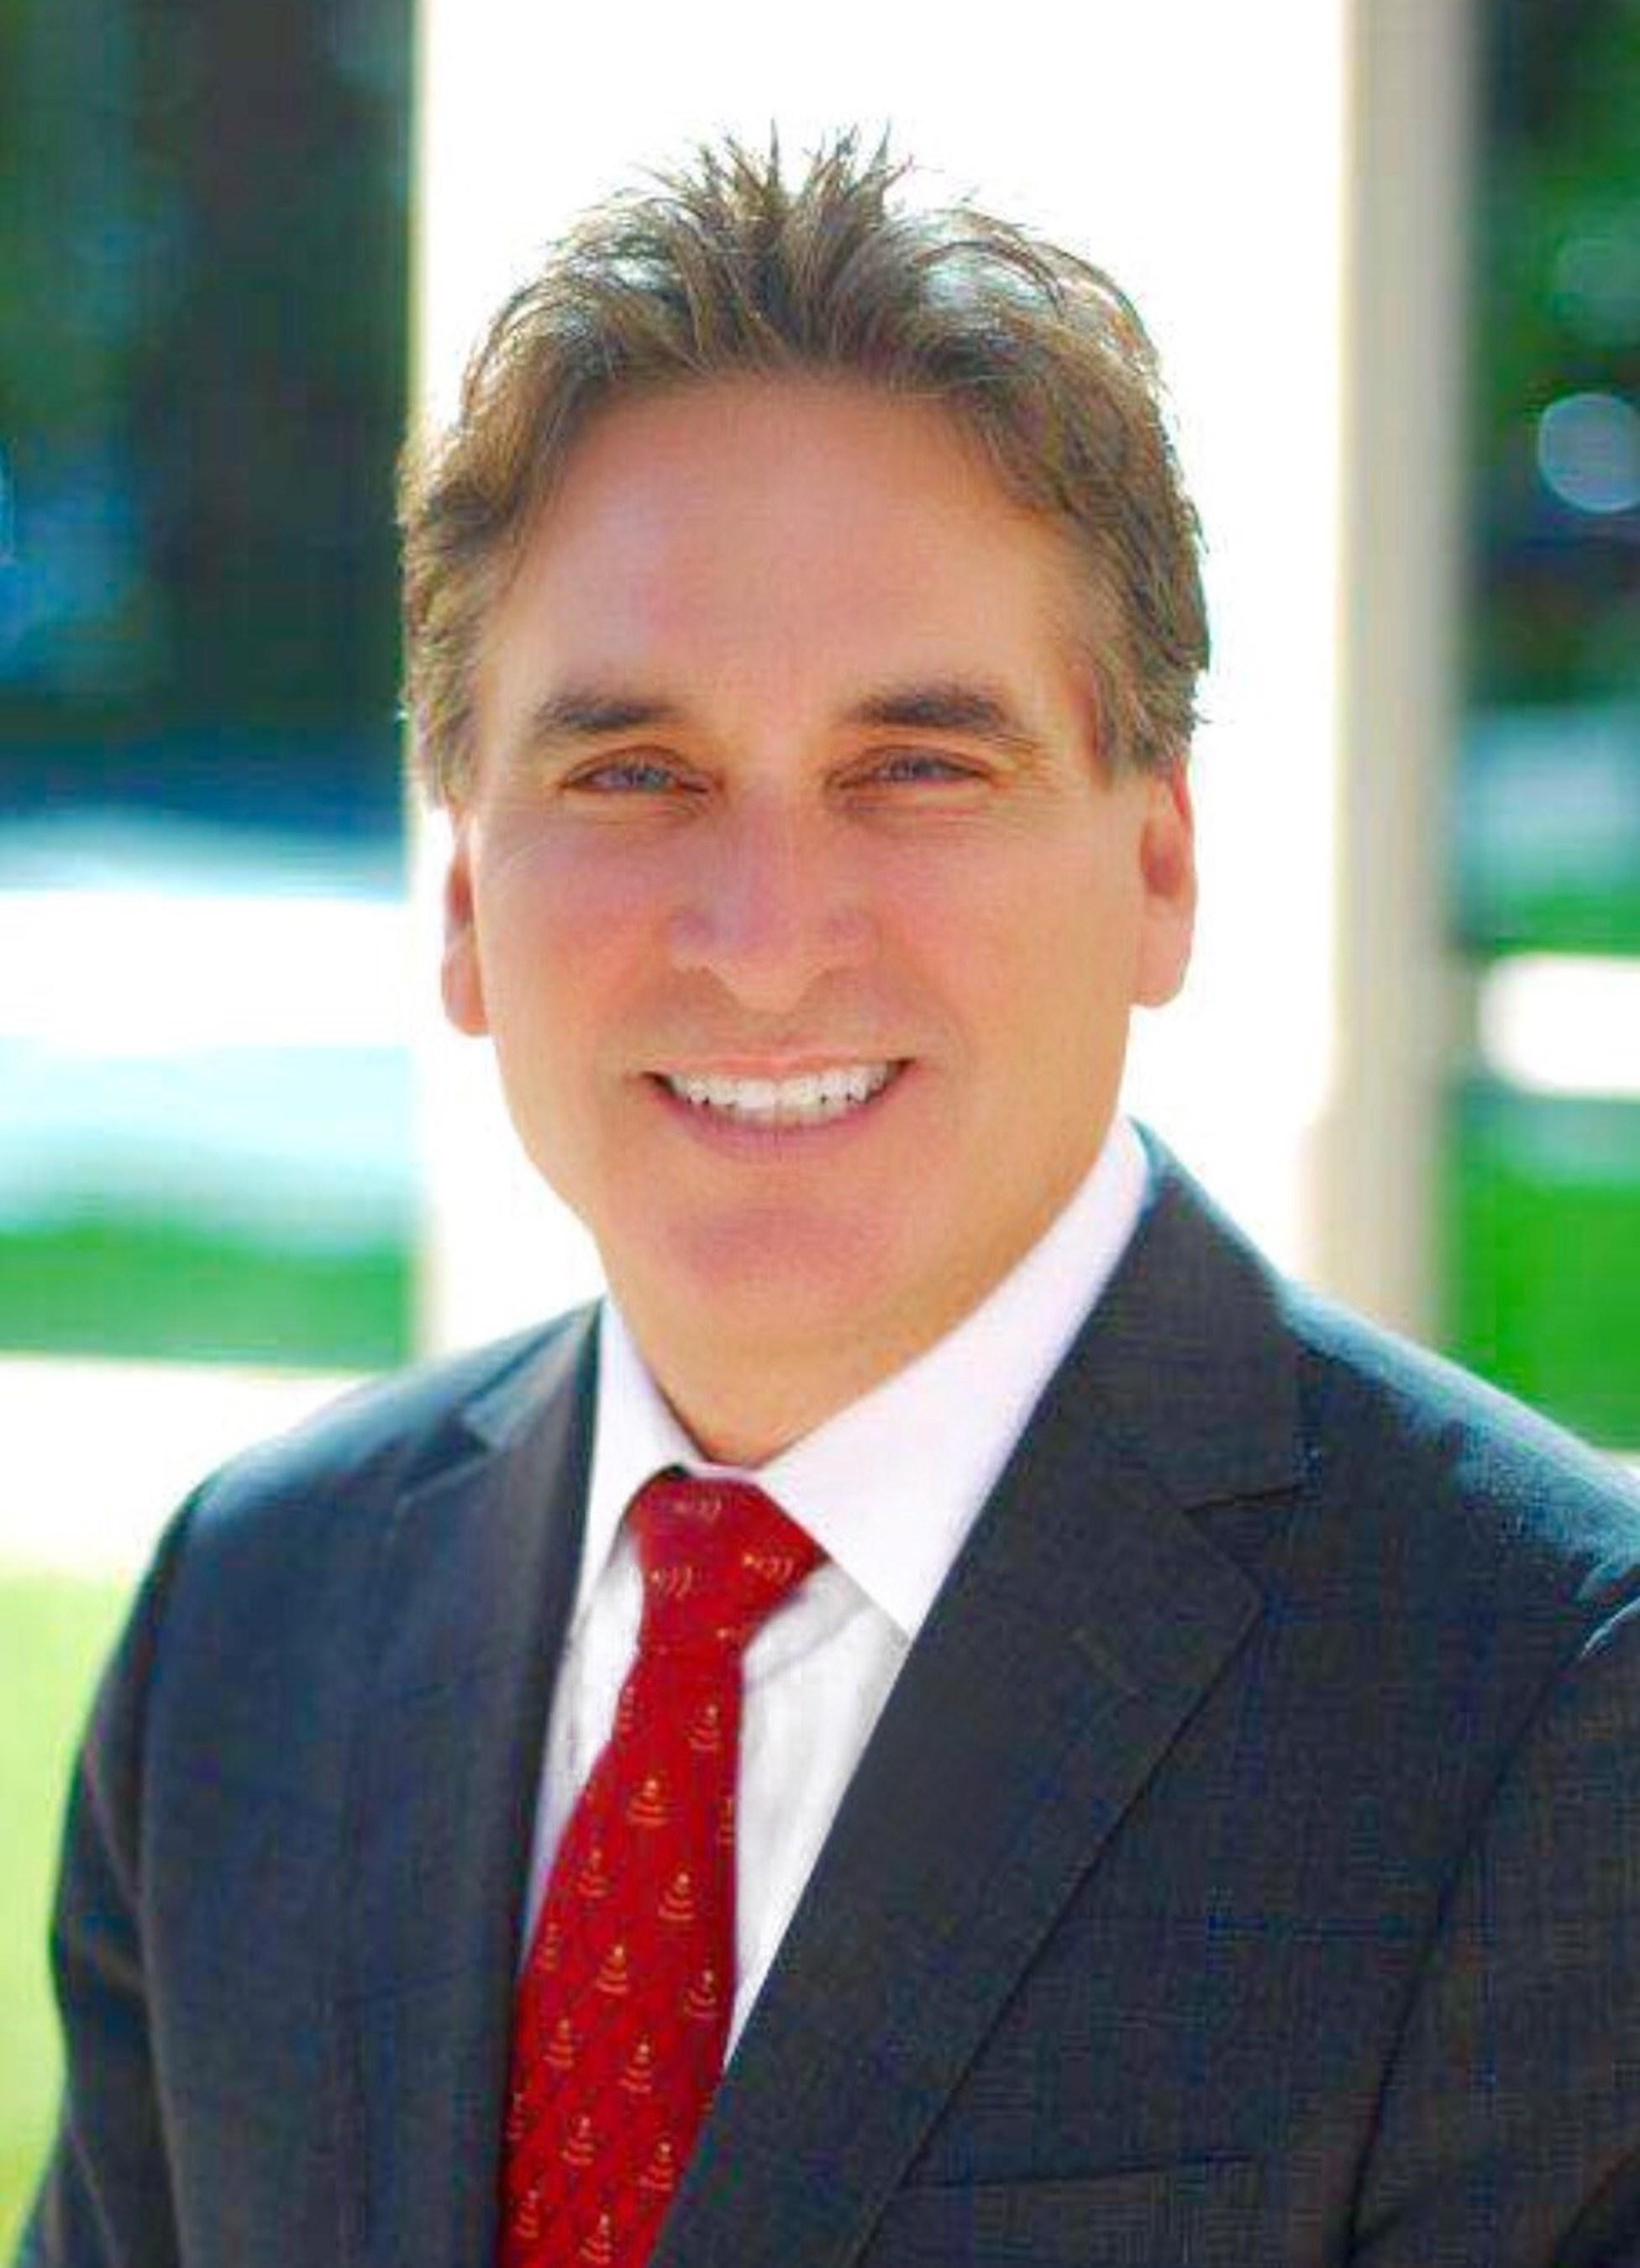 "Mario Caballero, CEO of Extraordinary Conceptions, announces their ""Spring into Surrogacy $1,500 Signing ..."